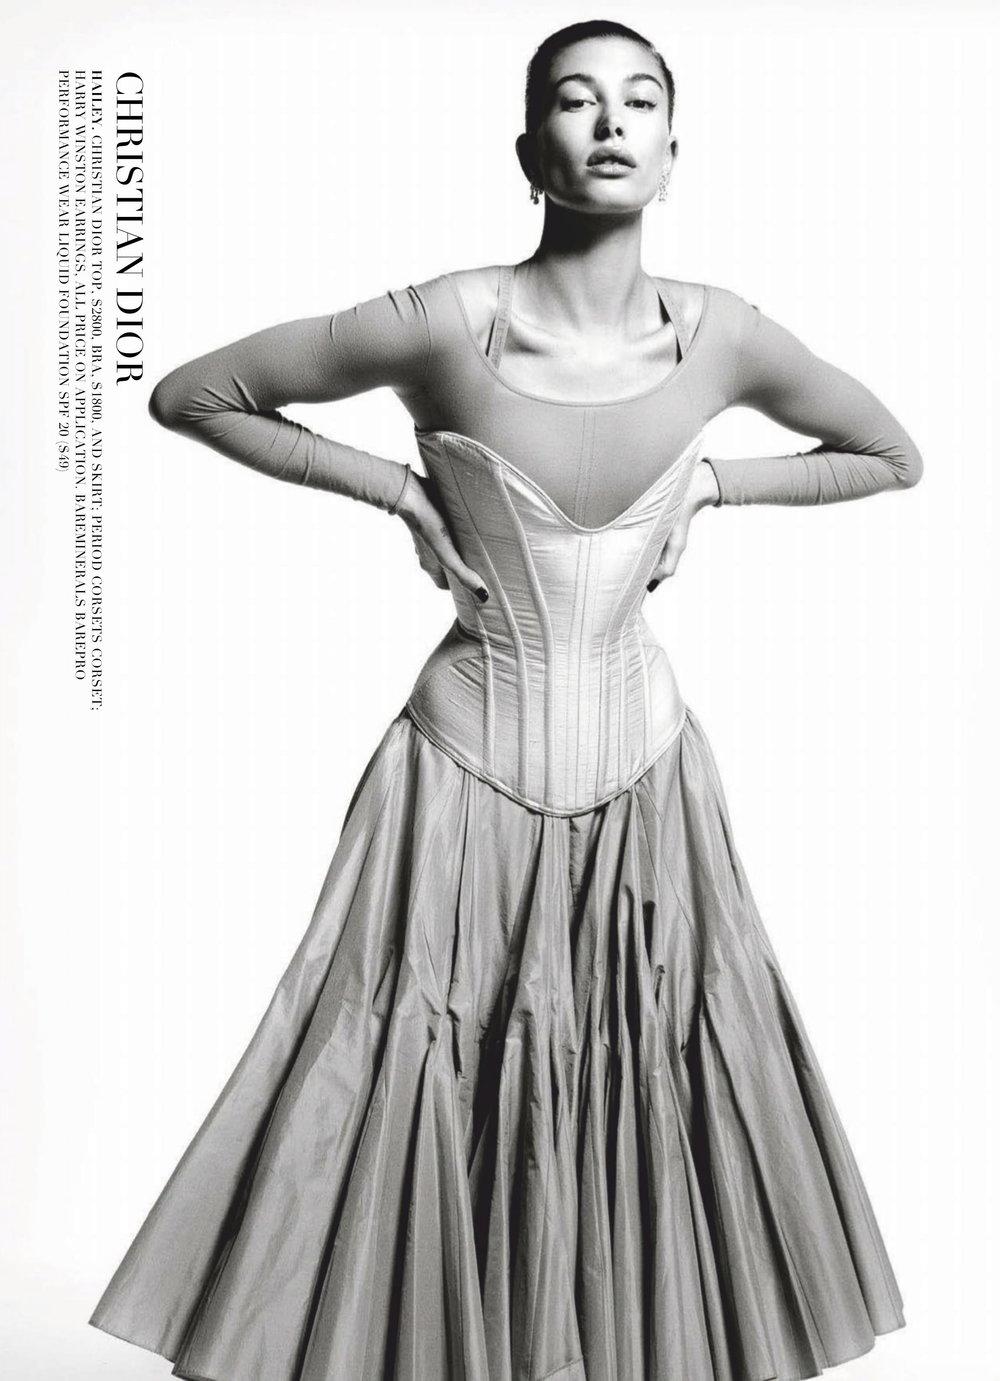 Mario Sorrenti for Harper's Bazaar Australia March 2019 (1).jpg